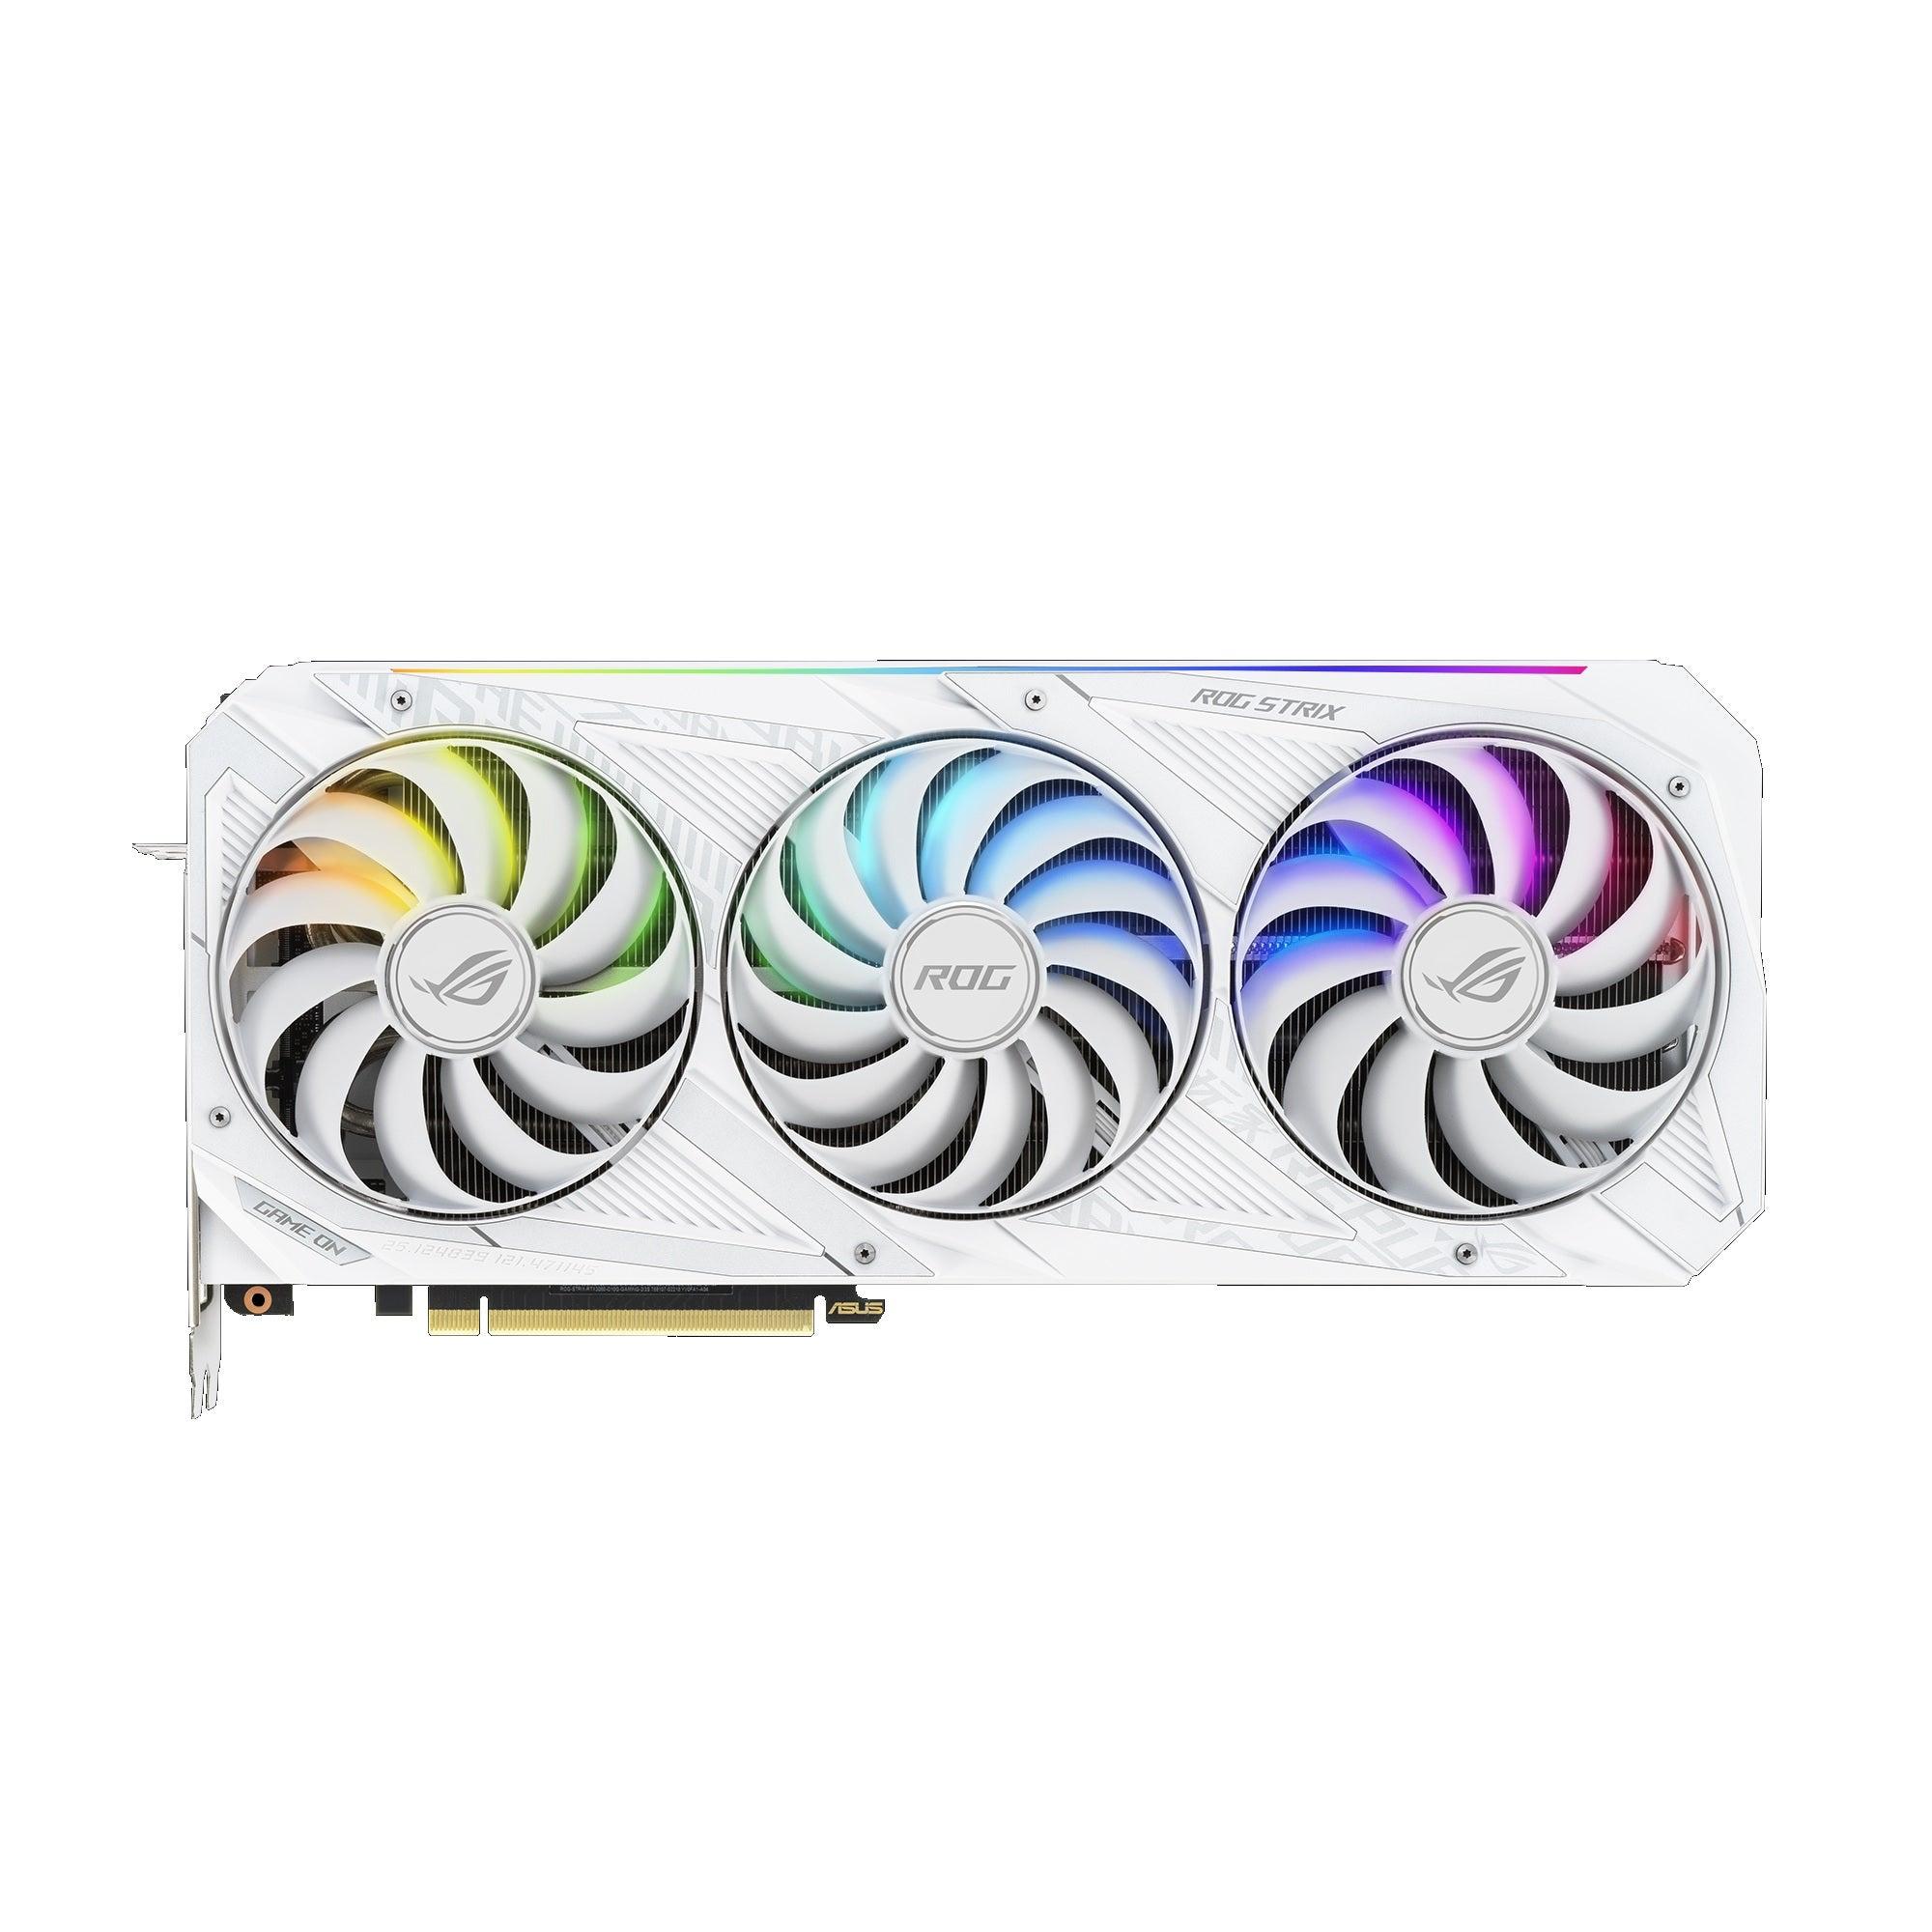 Asus ROG Strix GeForce RTX 3080 V2 White OC Edition Graphics Card